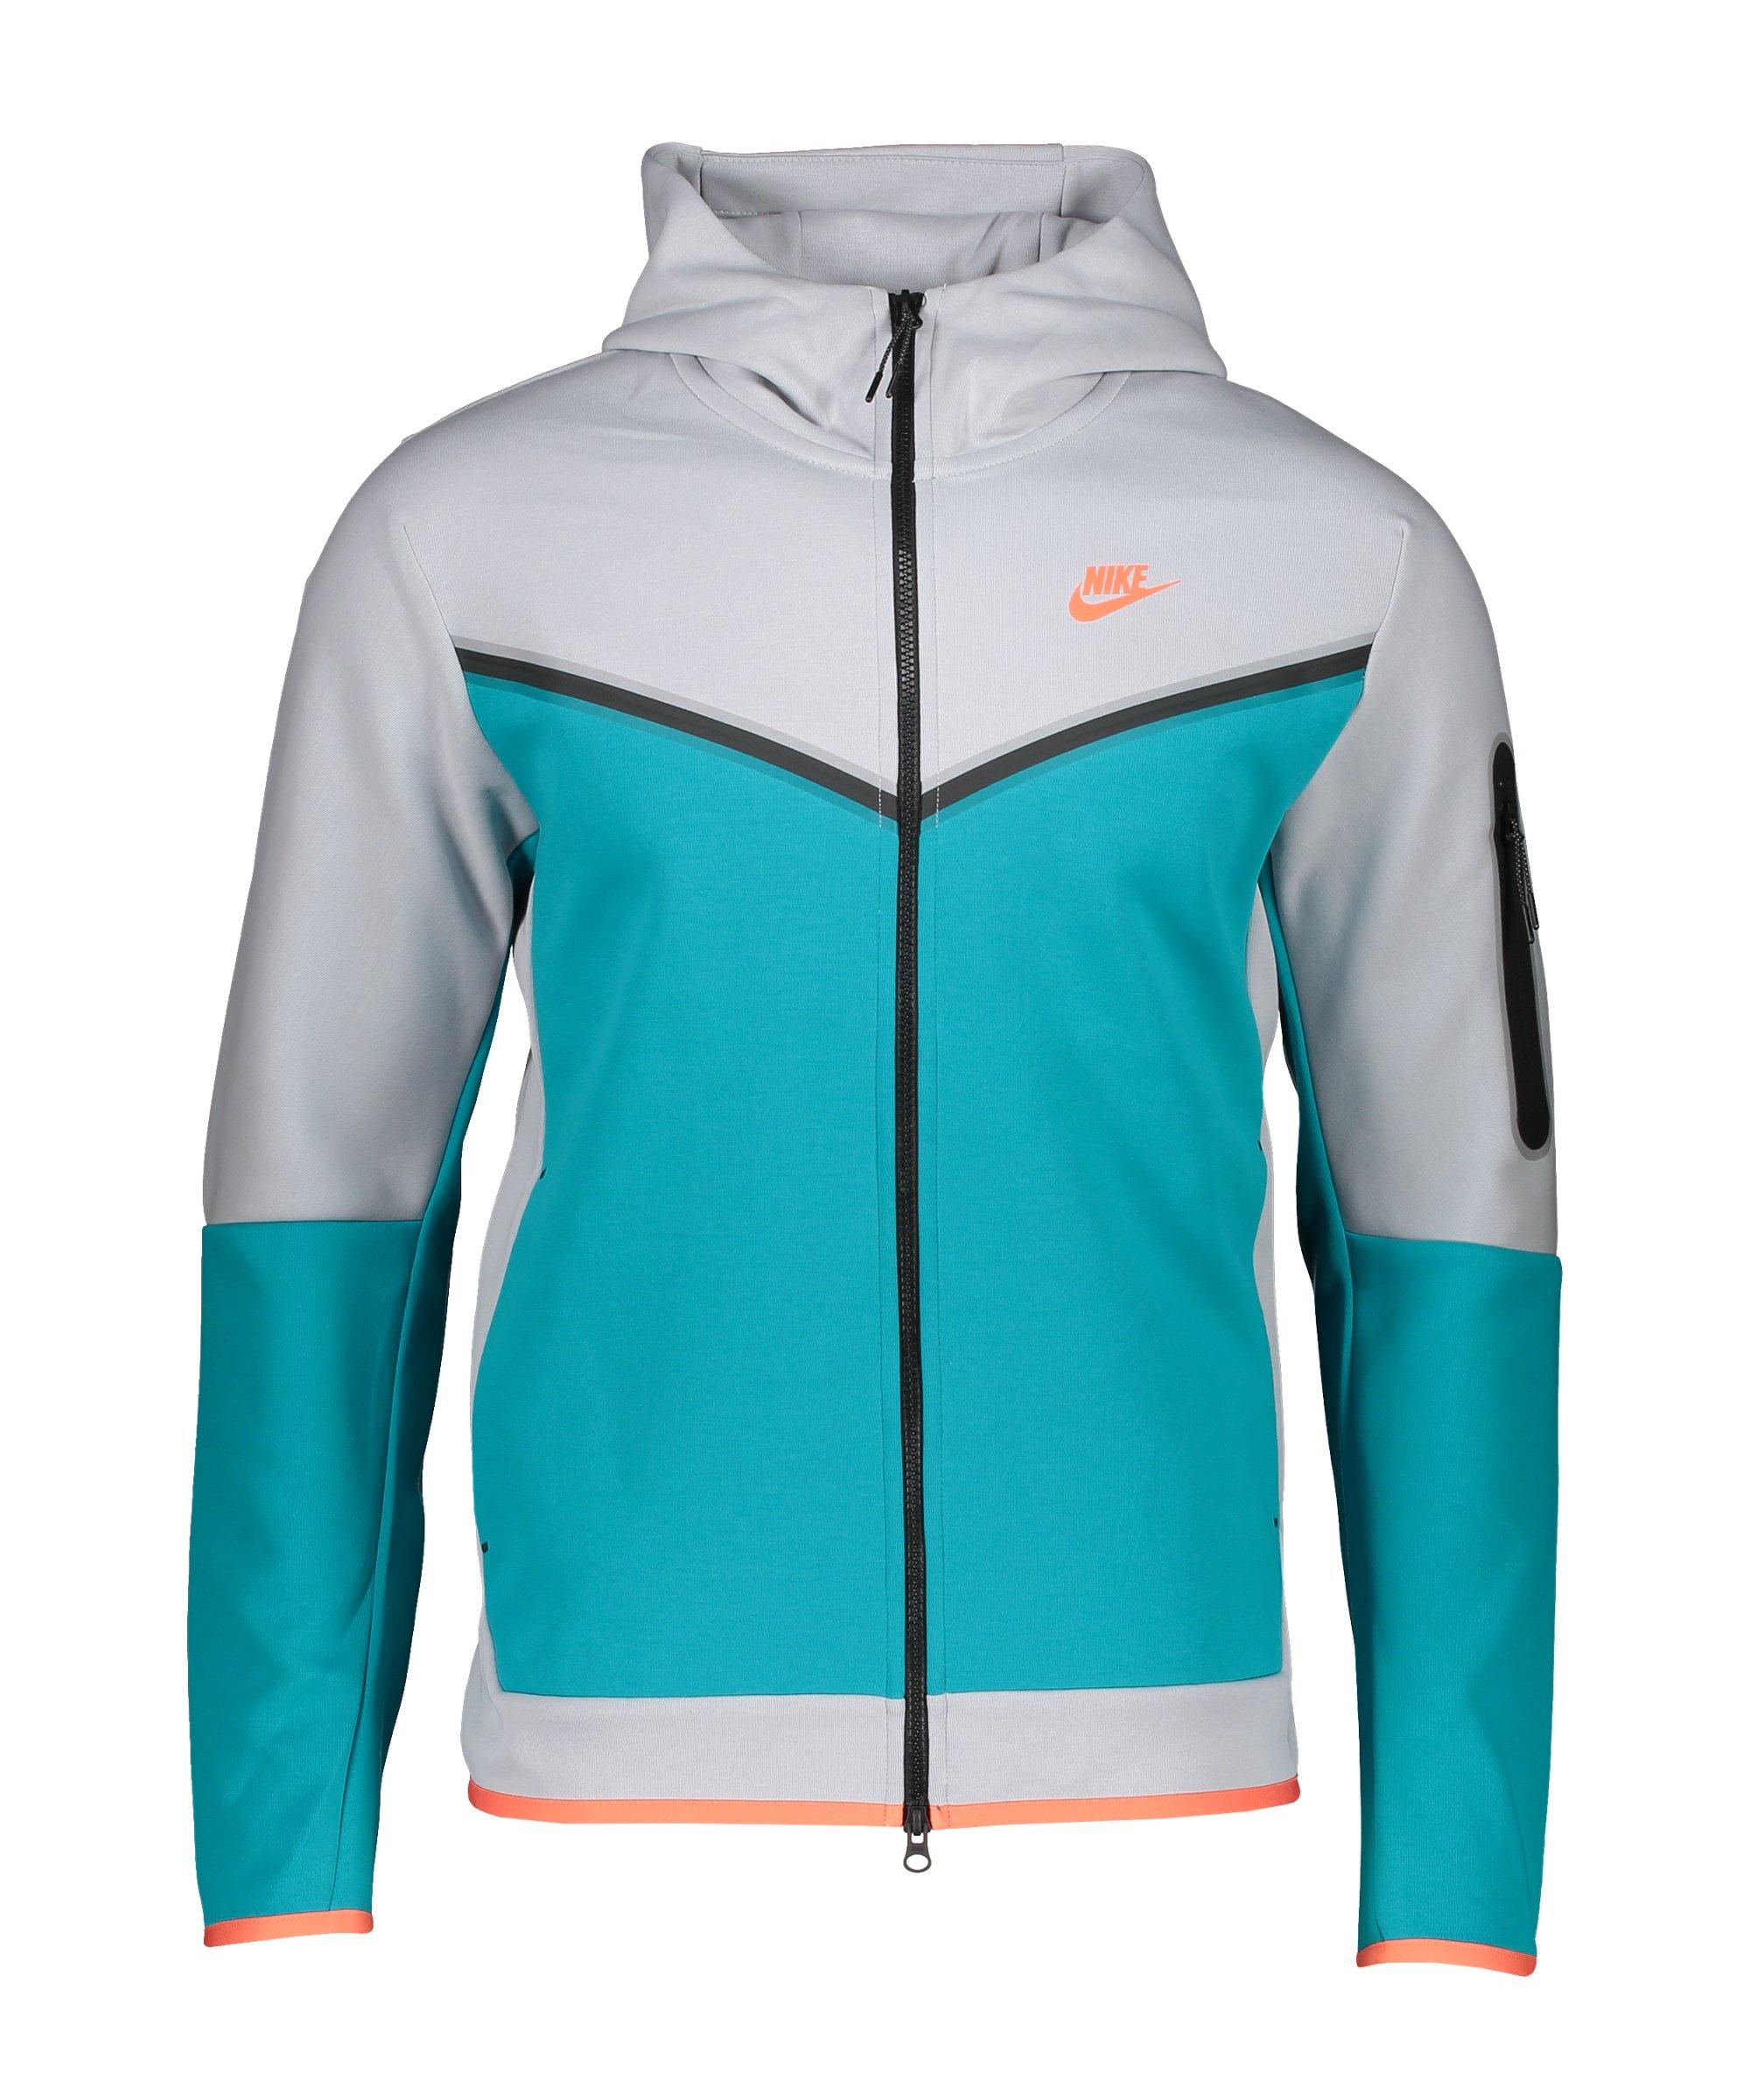 Nike Tech Fleece Windrunner Grau Blau F012 - tuerkis